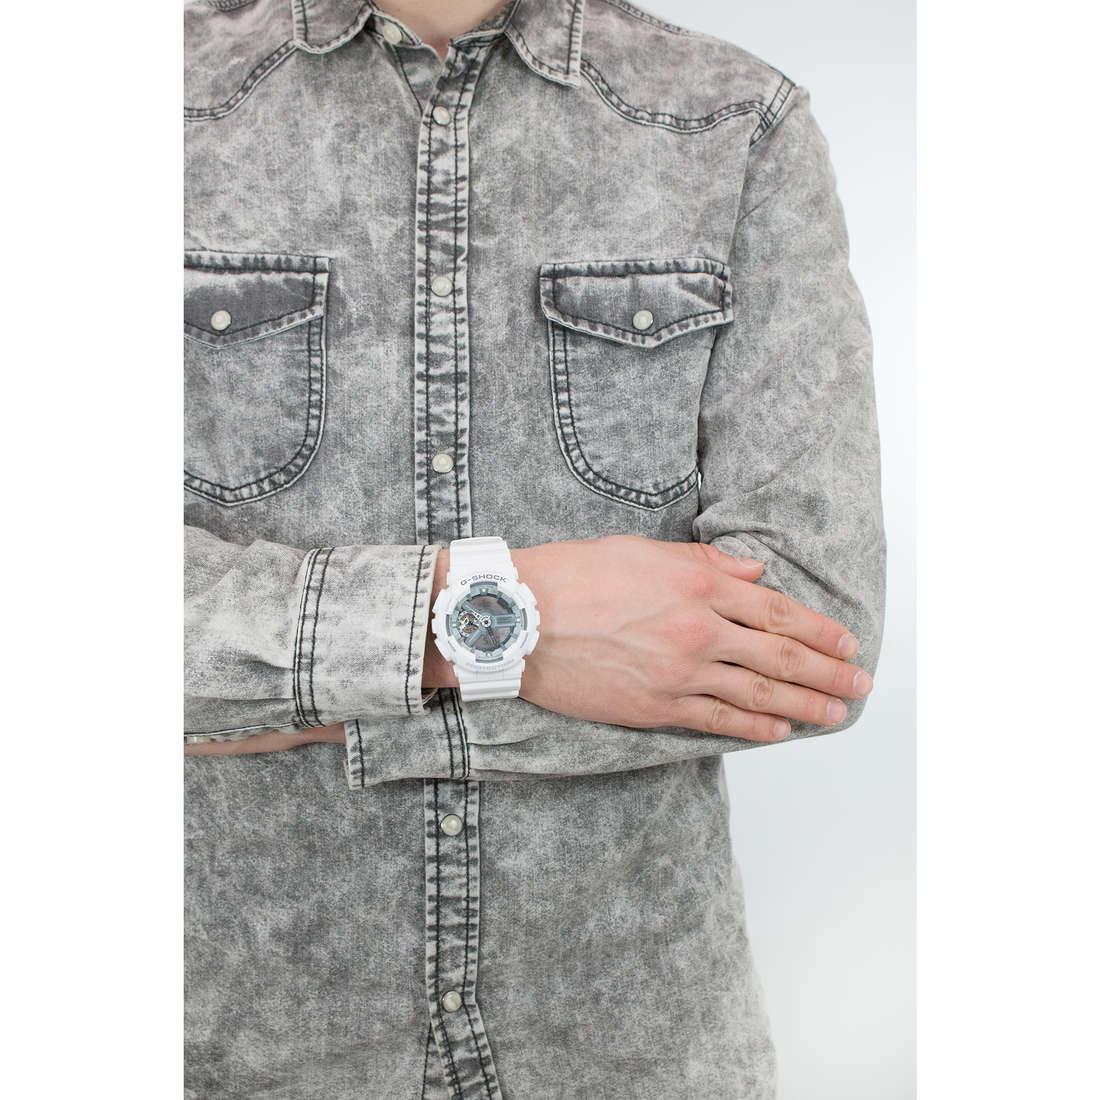 Casio digitali G-Shock uomo GA-110C-7AER indosso